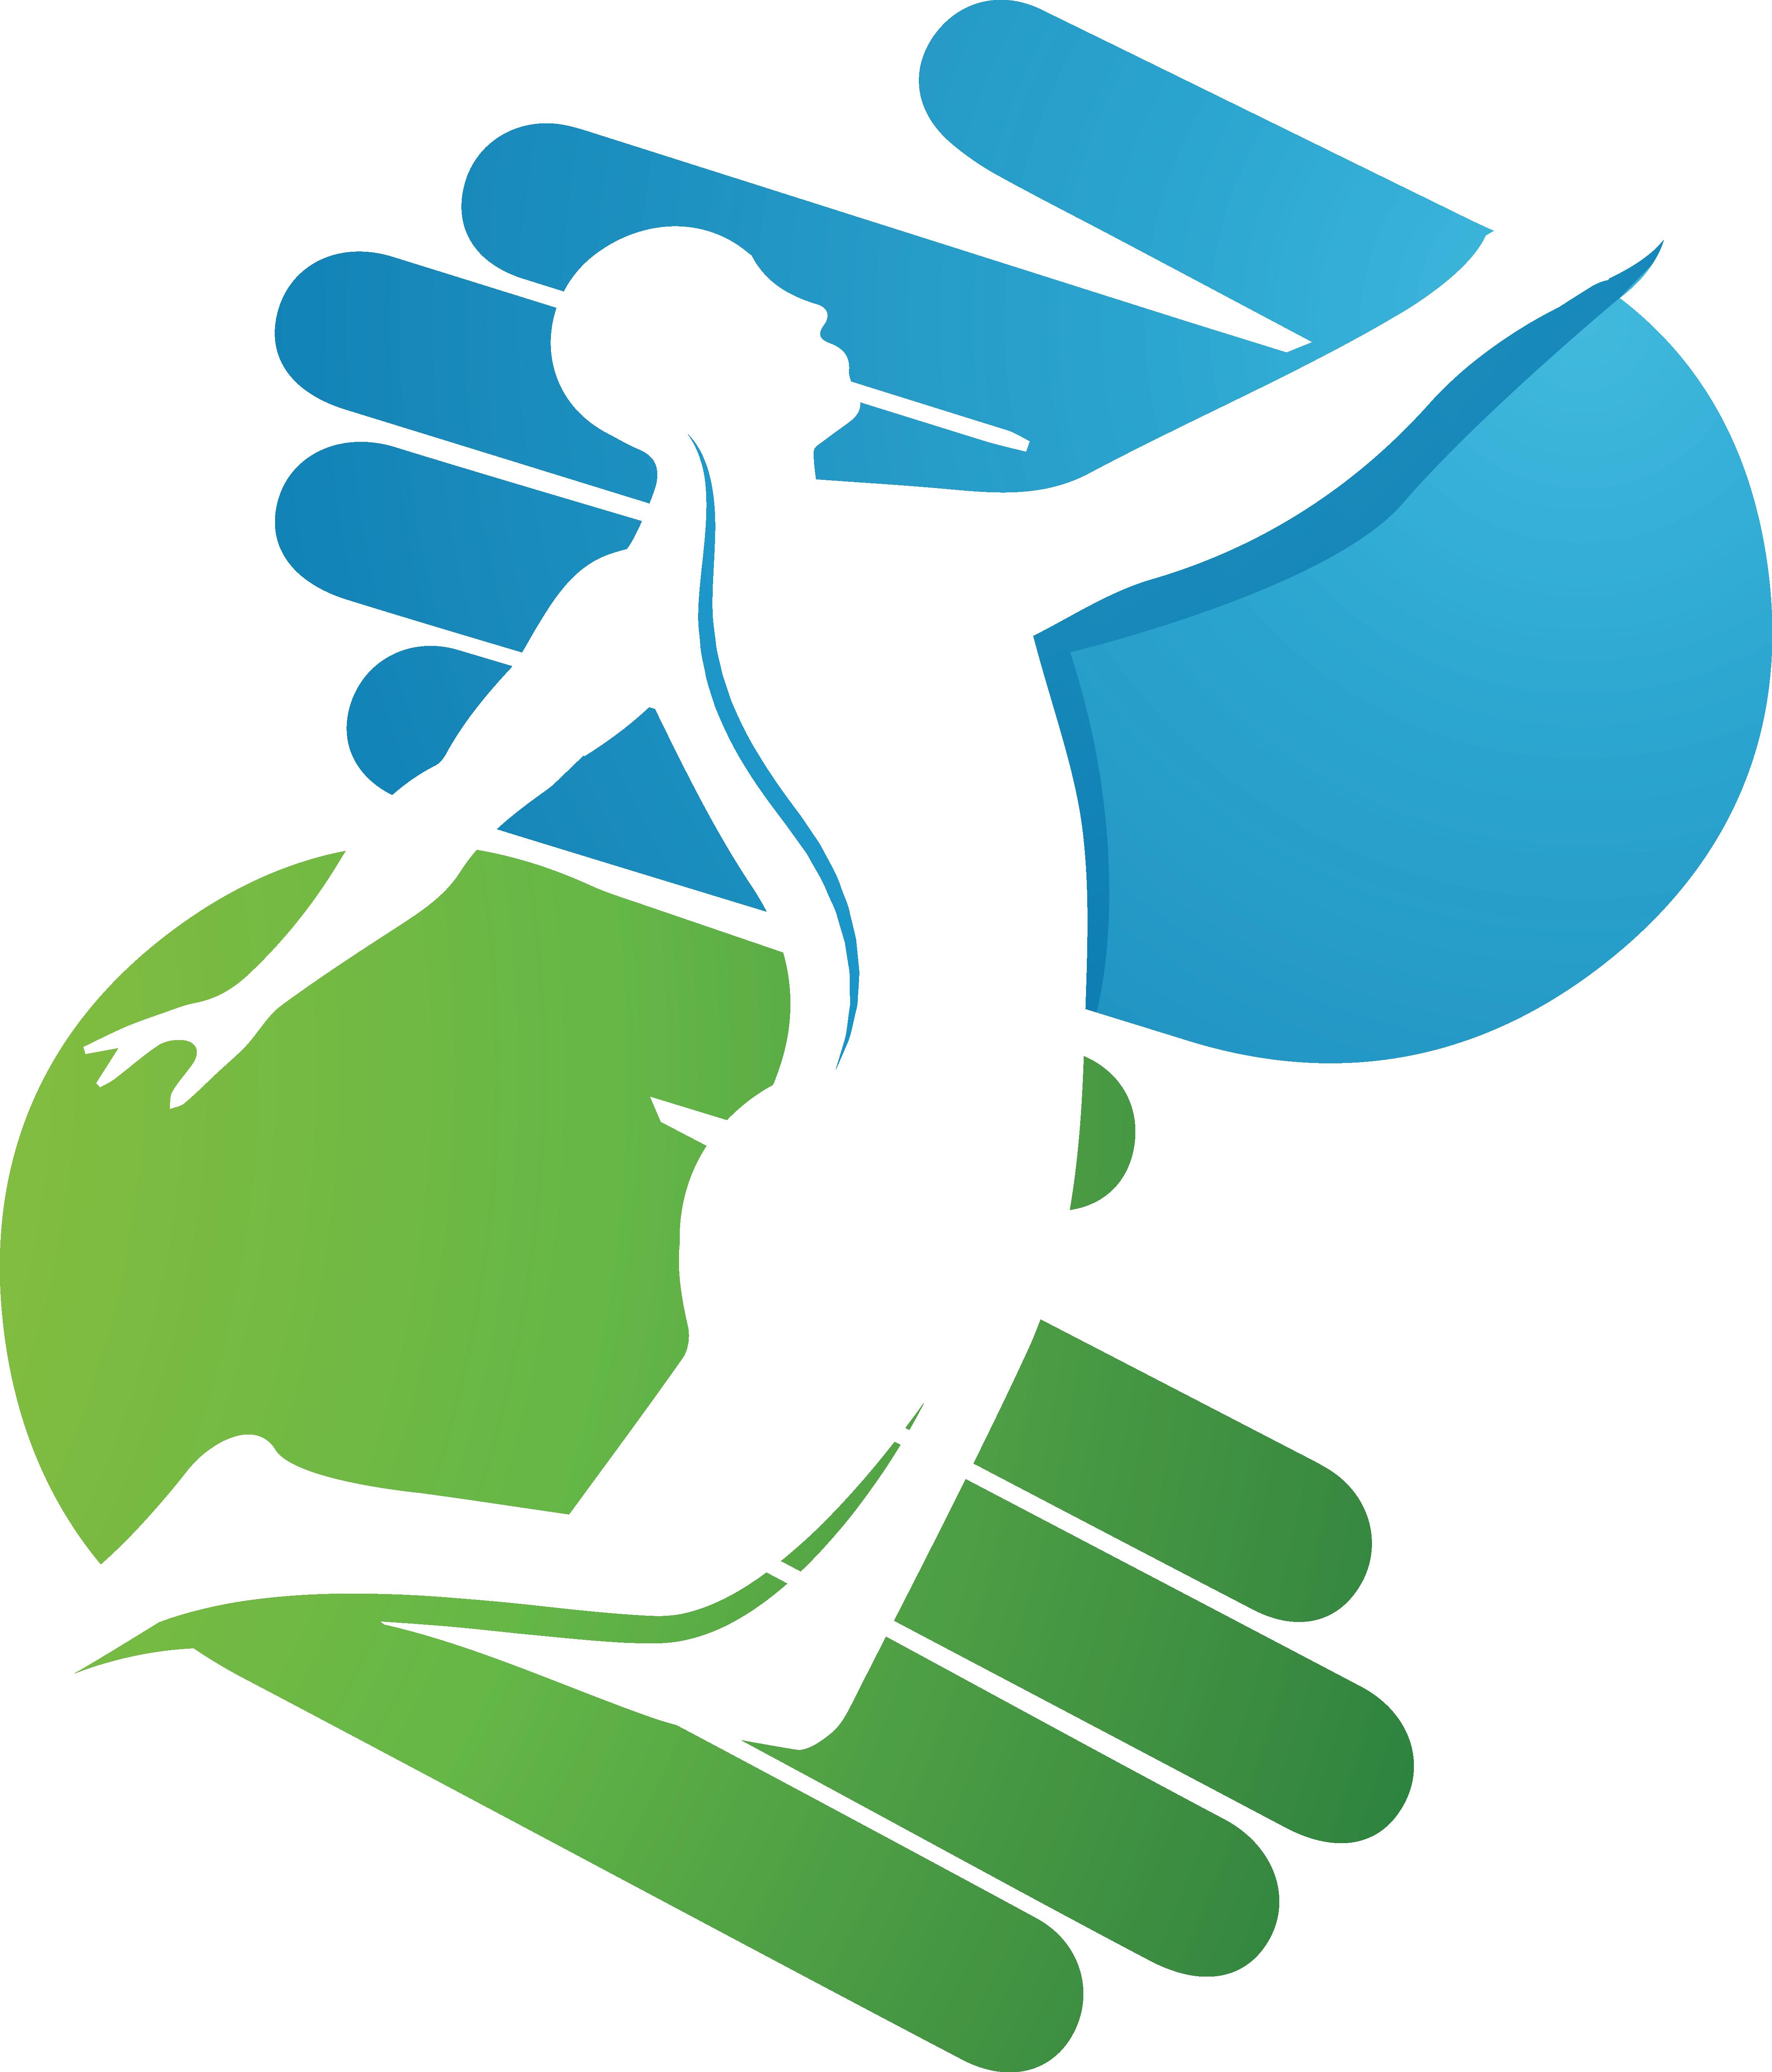 Design me an innovative logo for ''Toward Health''